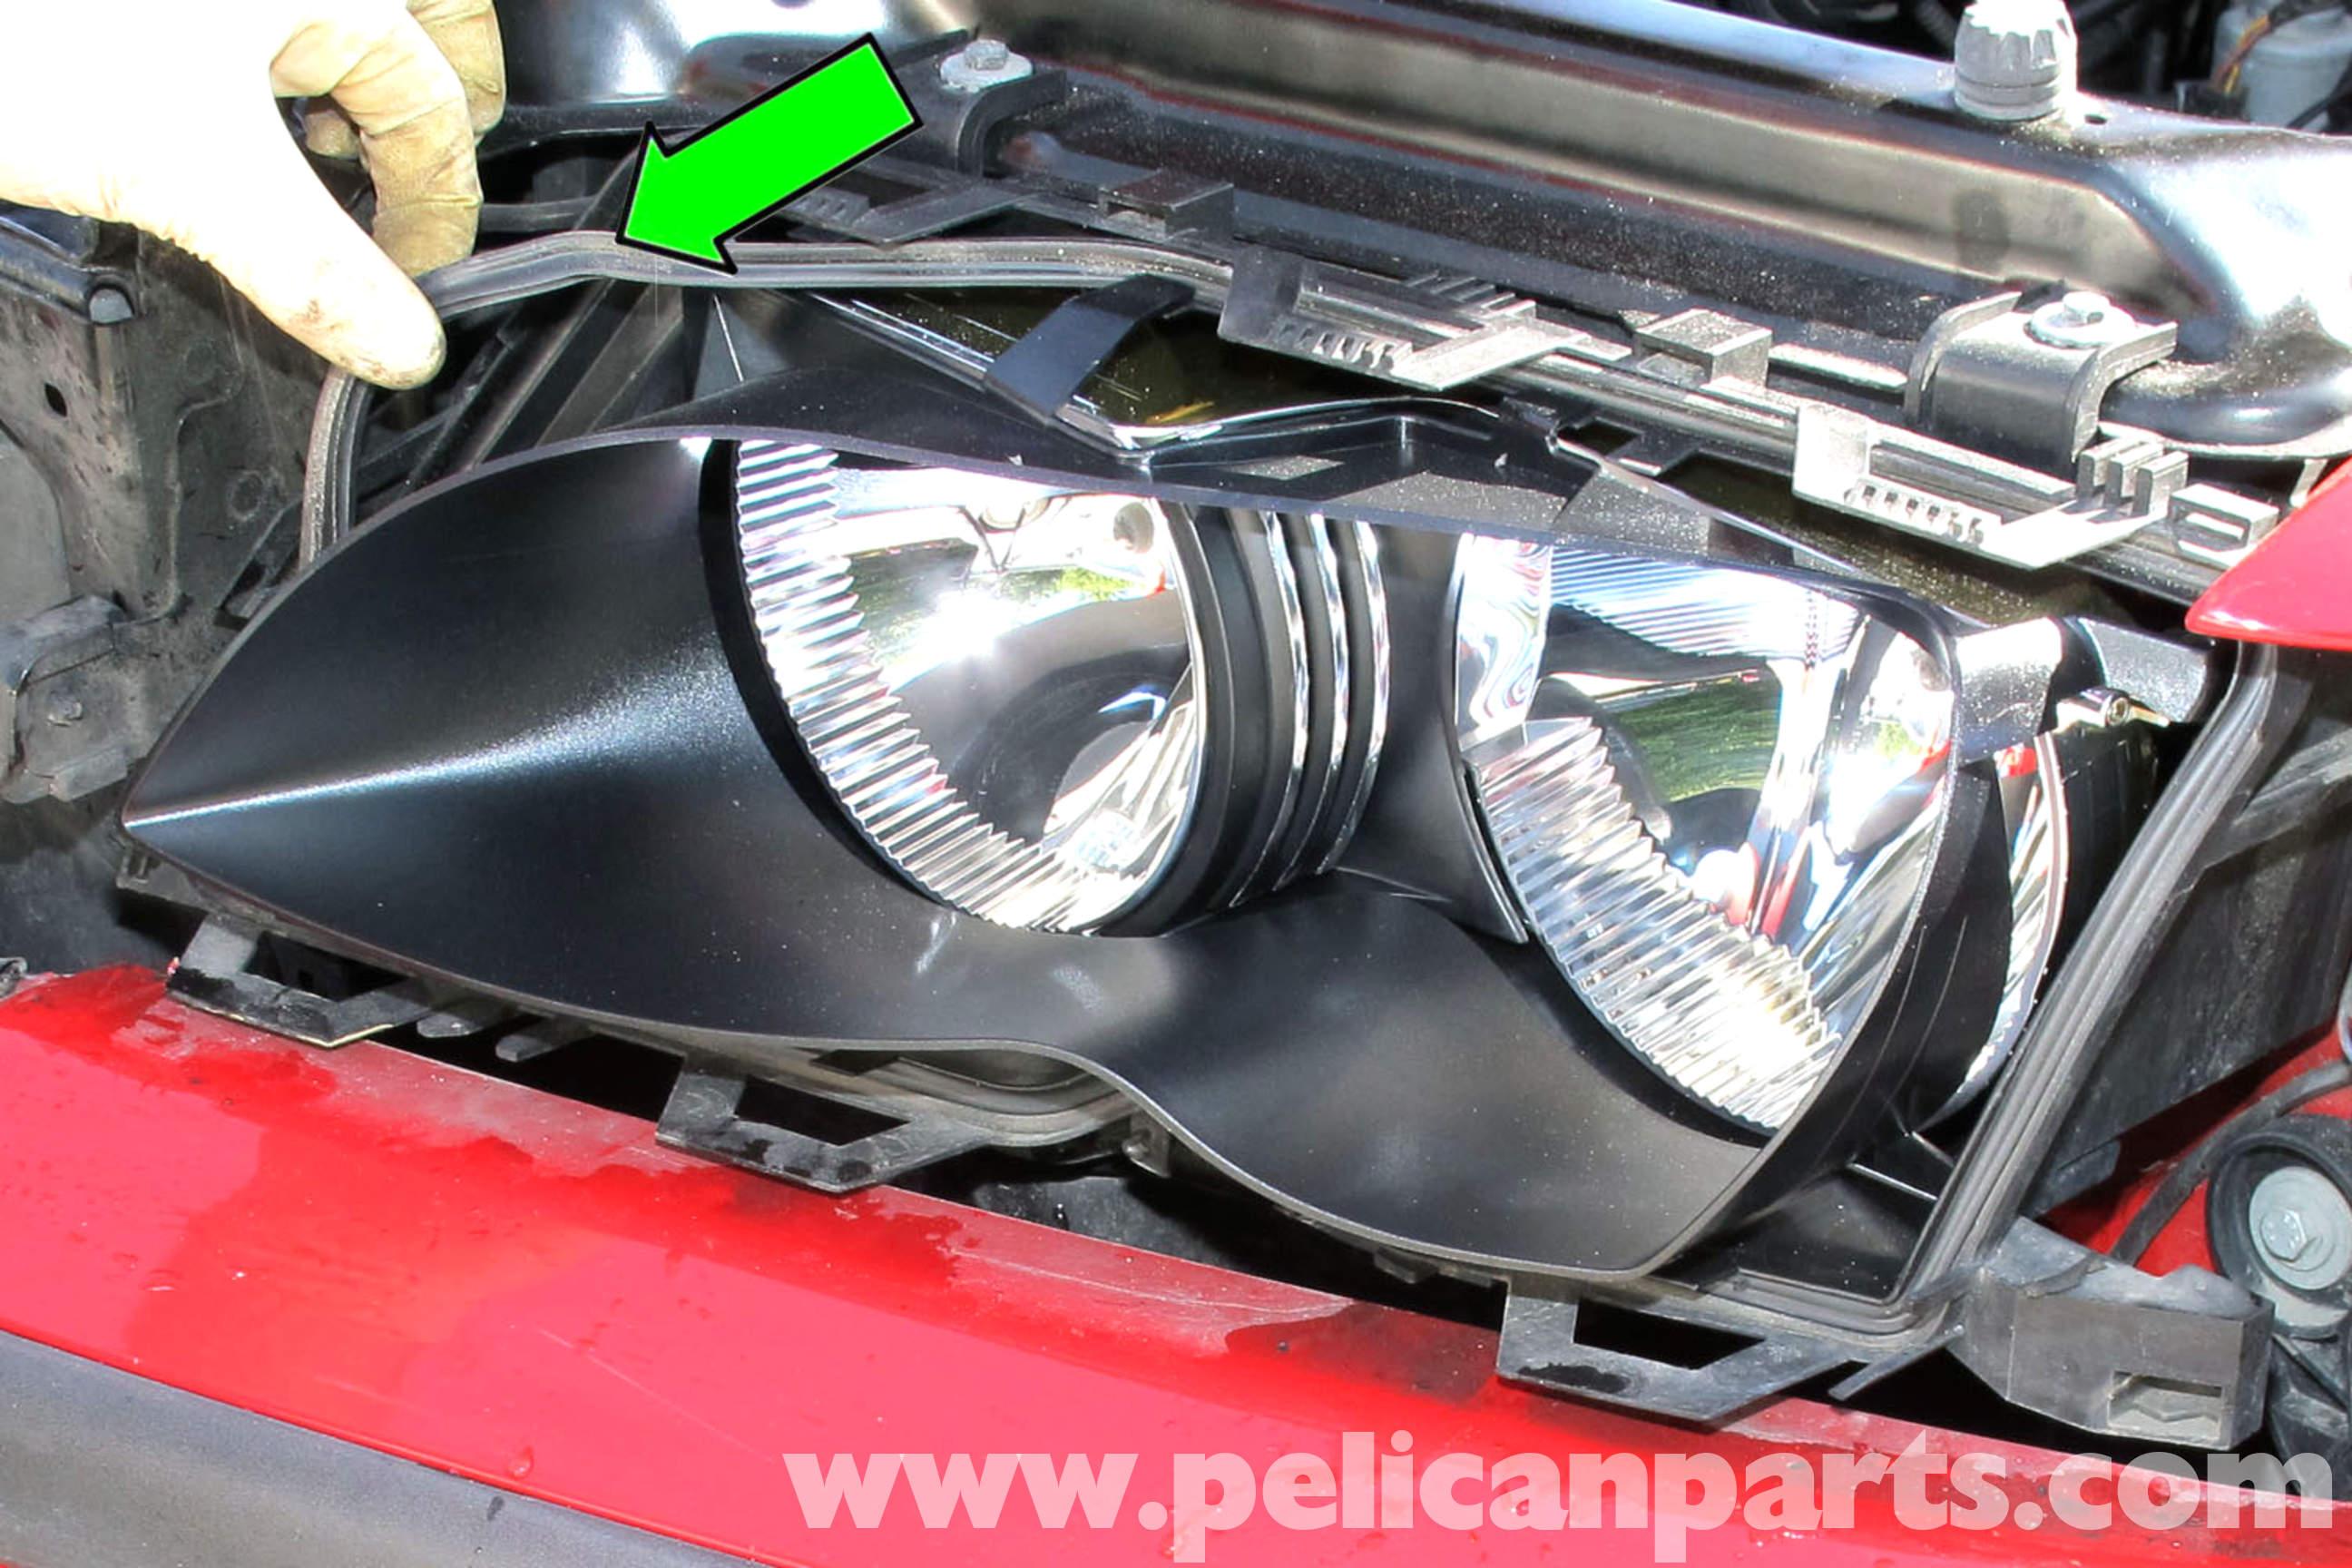 BMW E46 Headlight Lens Replacement | BMW 325i (2001-2005), BMW 325Xi ...